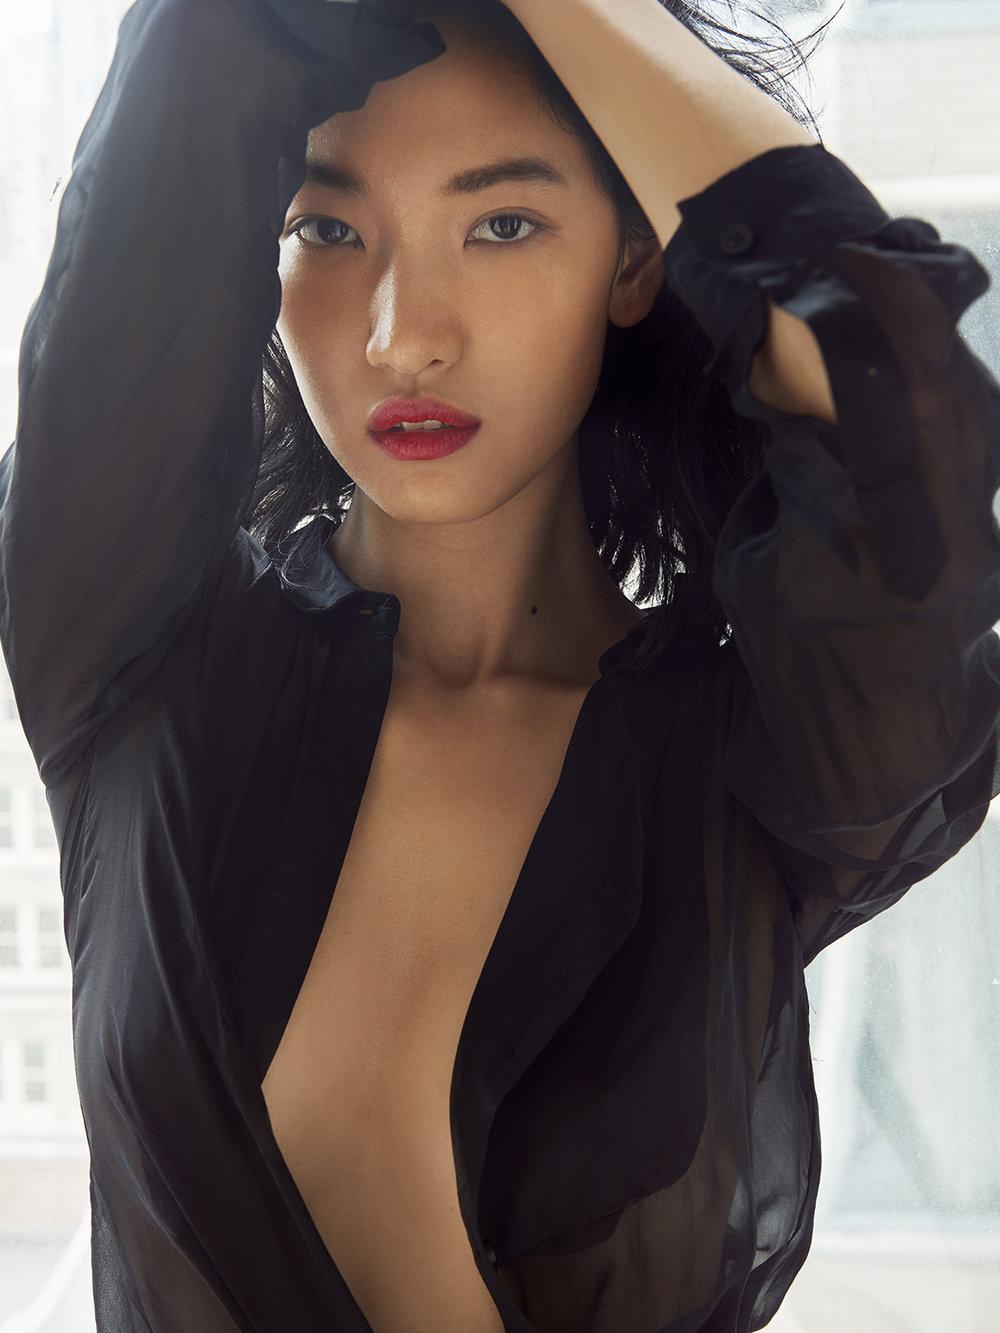 Harten_Nafziger_beauty_photographer_valeri_paumelle_agent (51).jpg